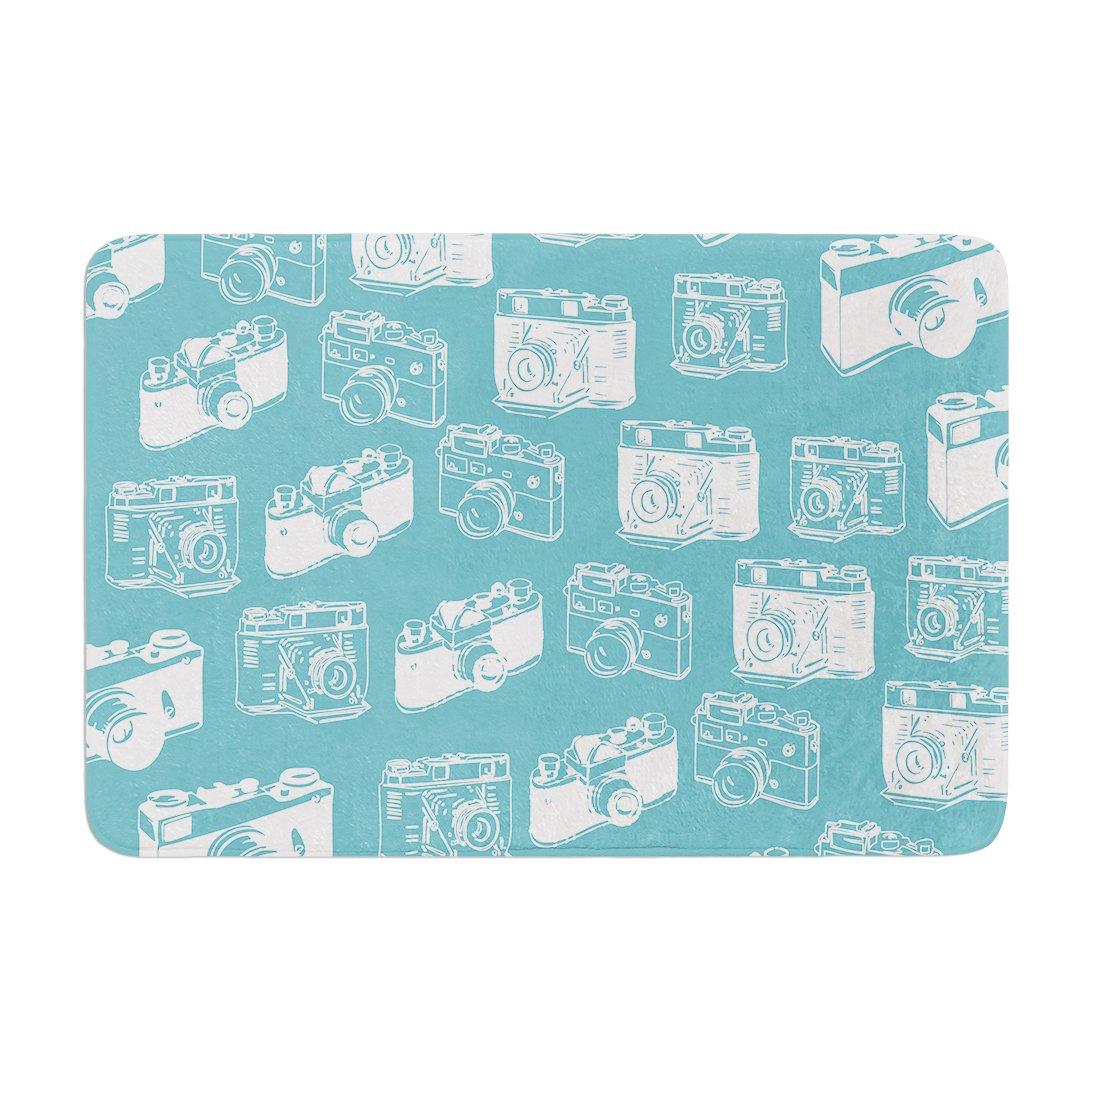 Kess InHouse 'Kess Original Camera Pattern G. Blu Memory Foam Bath Mat, 17 by 24'